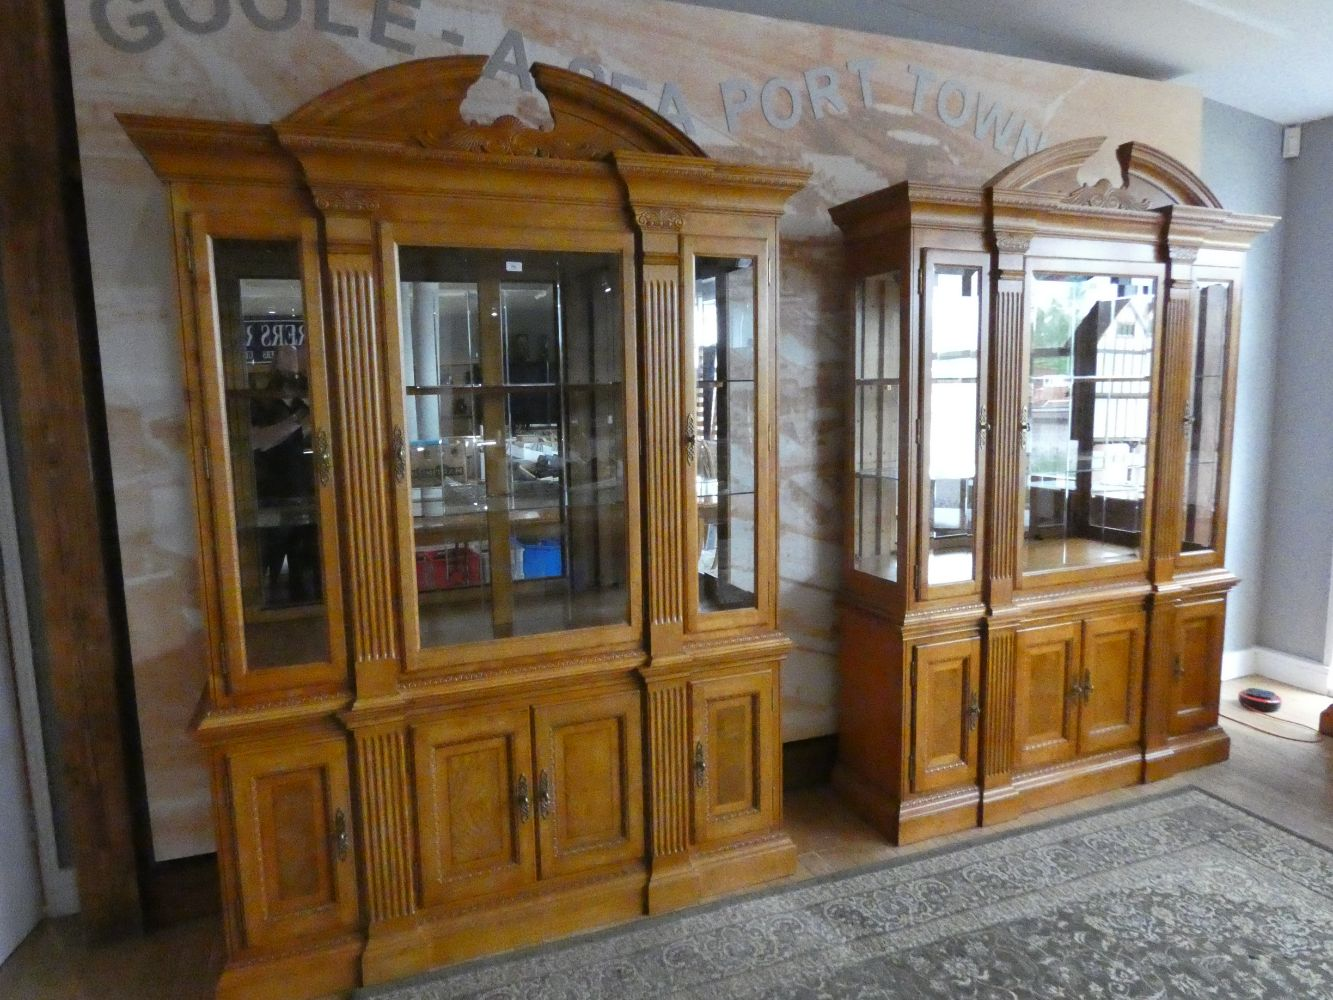 Victoriana, Home Furnishings, Cameras, Clocks and Ceramics